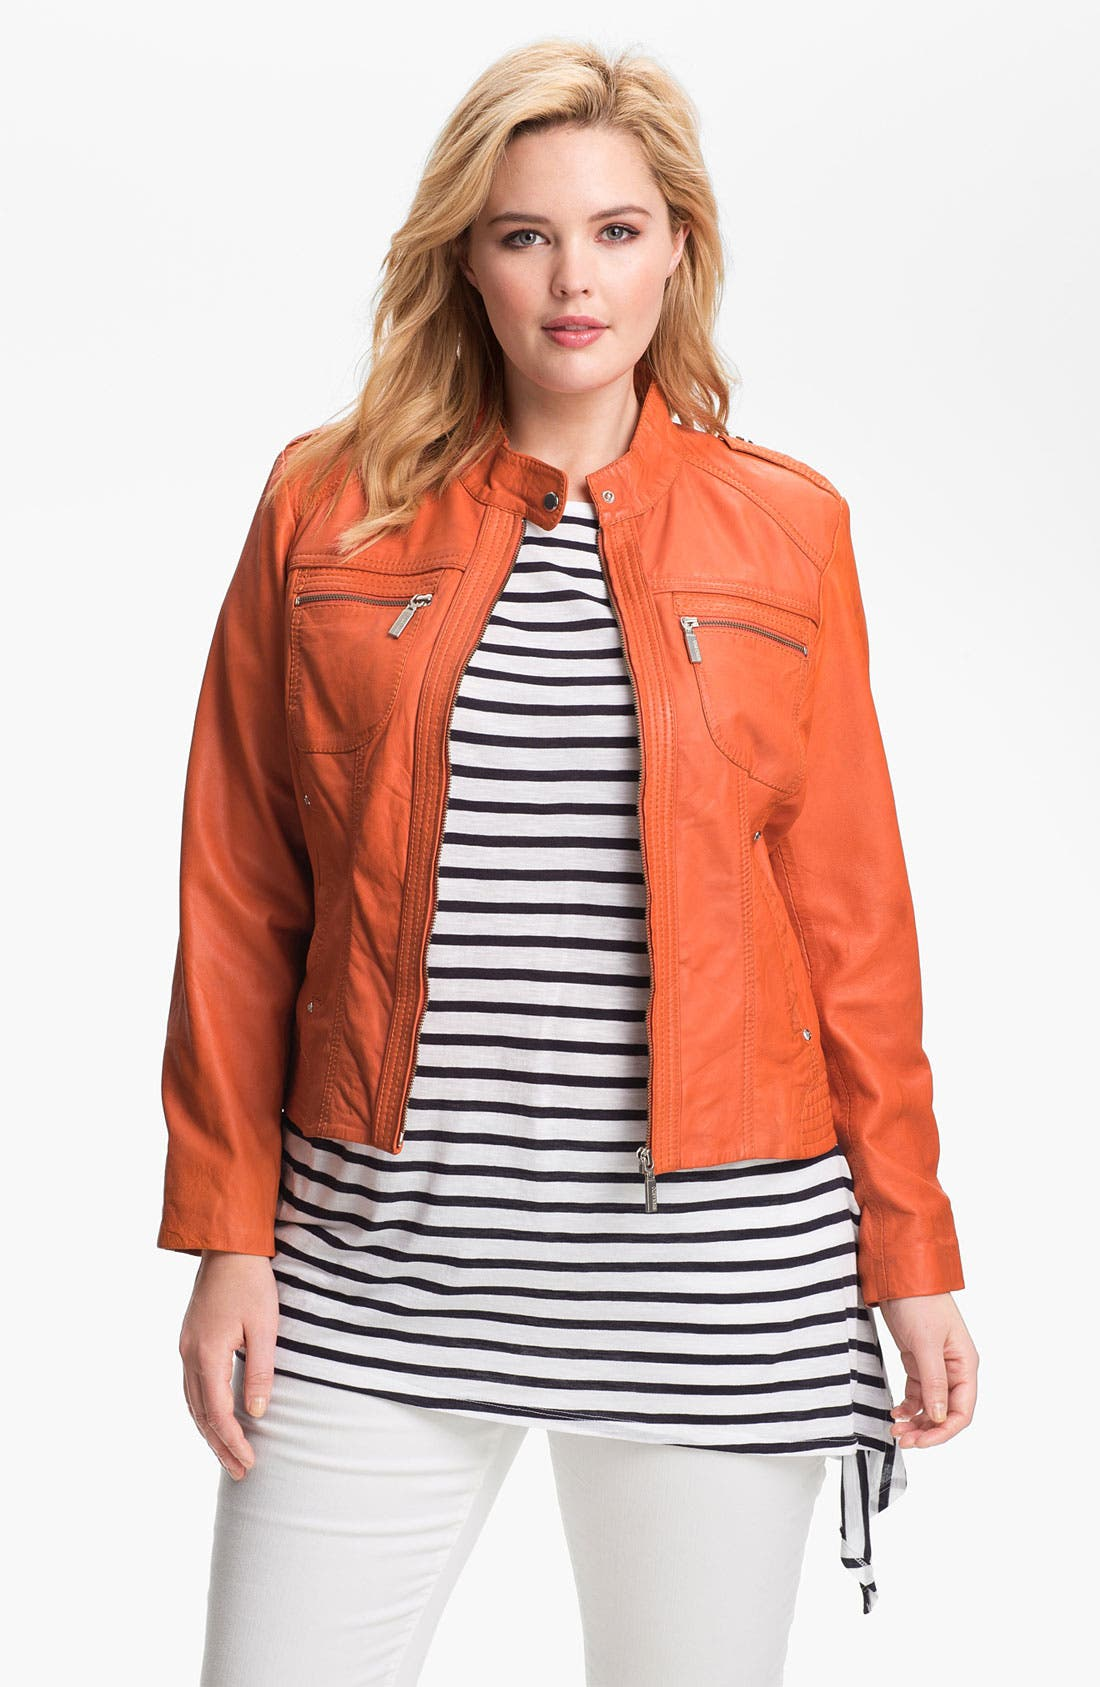 Alternate Image 1 Selected - Bernardo Leather Scuba Jacket (Plus) (Nordstrom Exclusive)